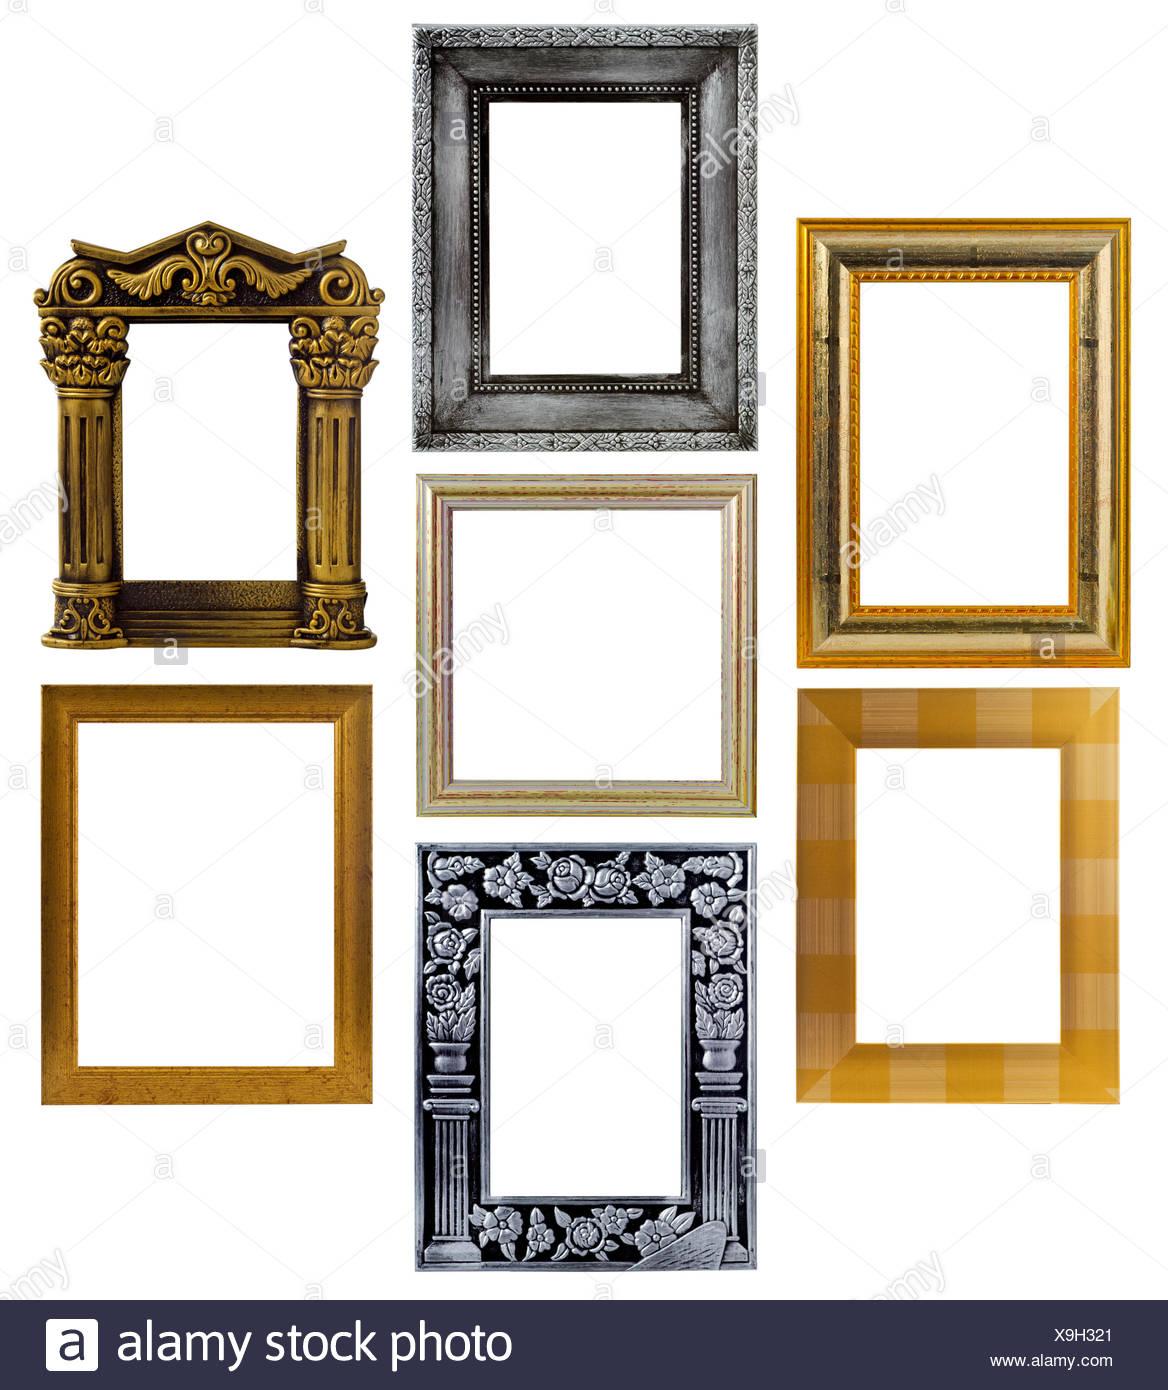 Fotorahmen Stock Photos & Fotorahmen Stock Images - Alamy